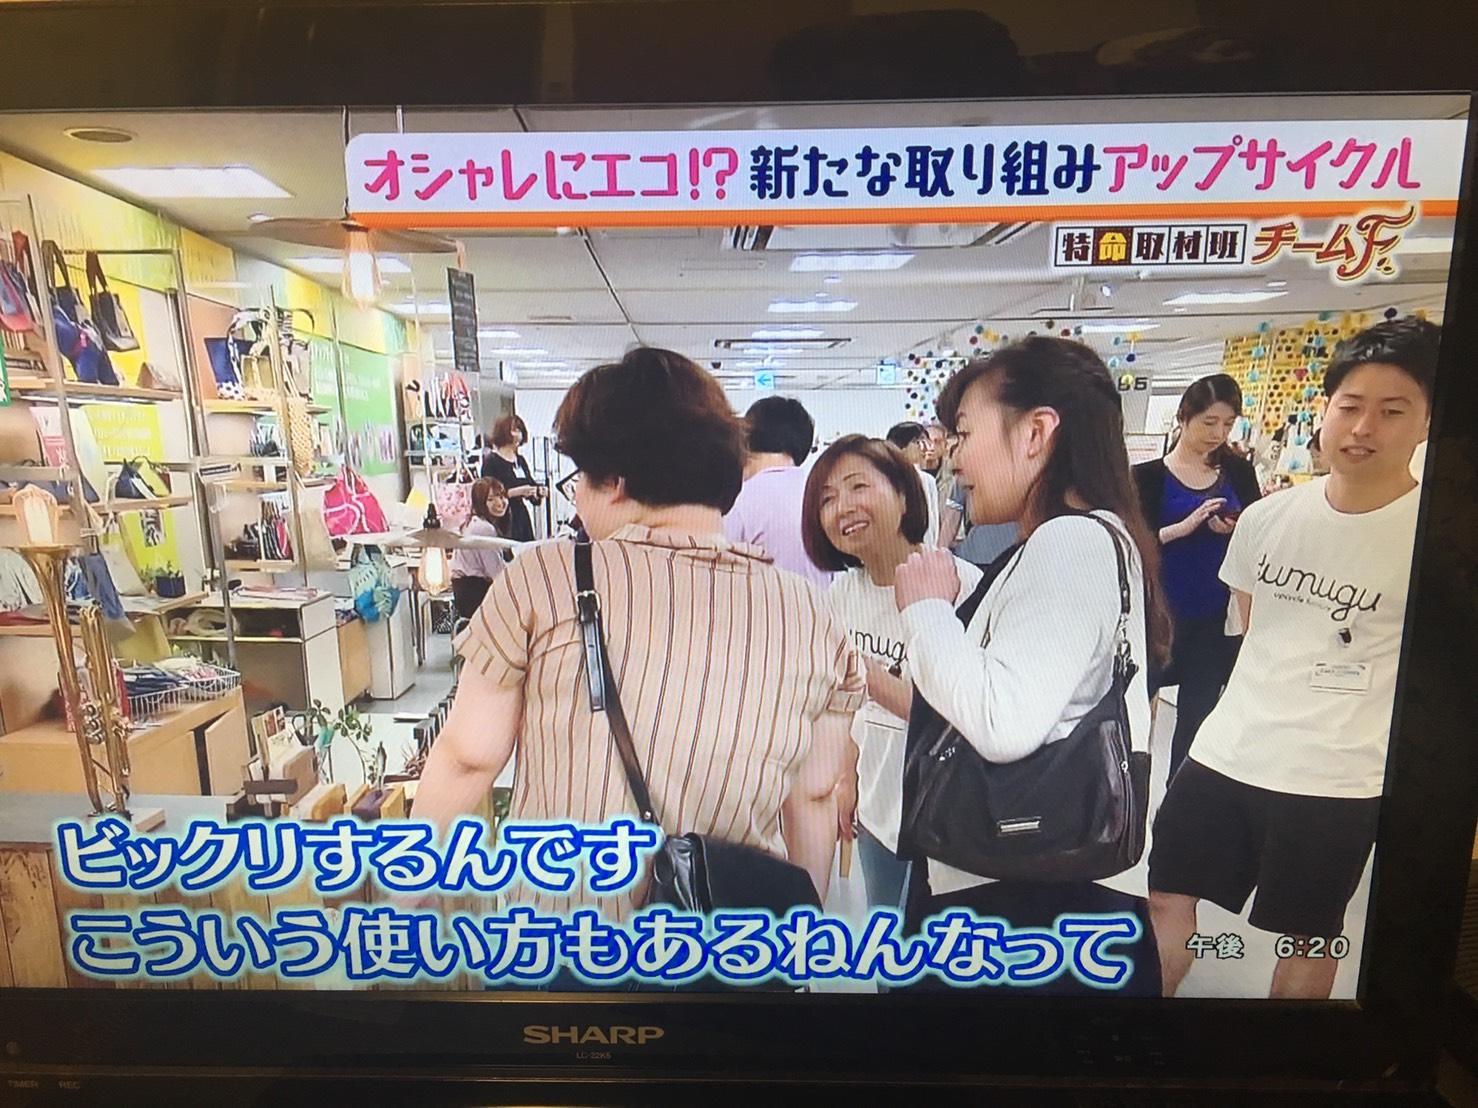 【大阪毎日放送「ミント!」】出演